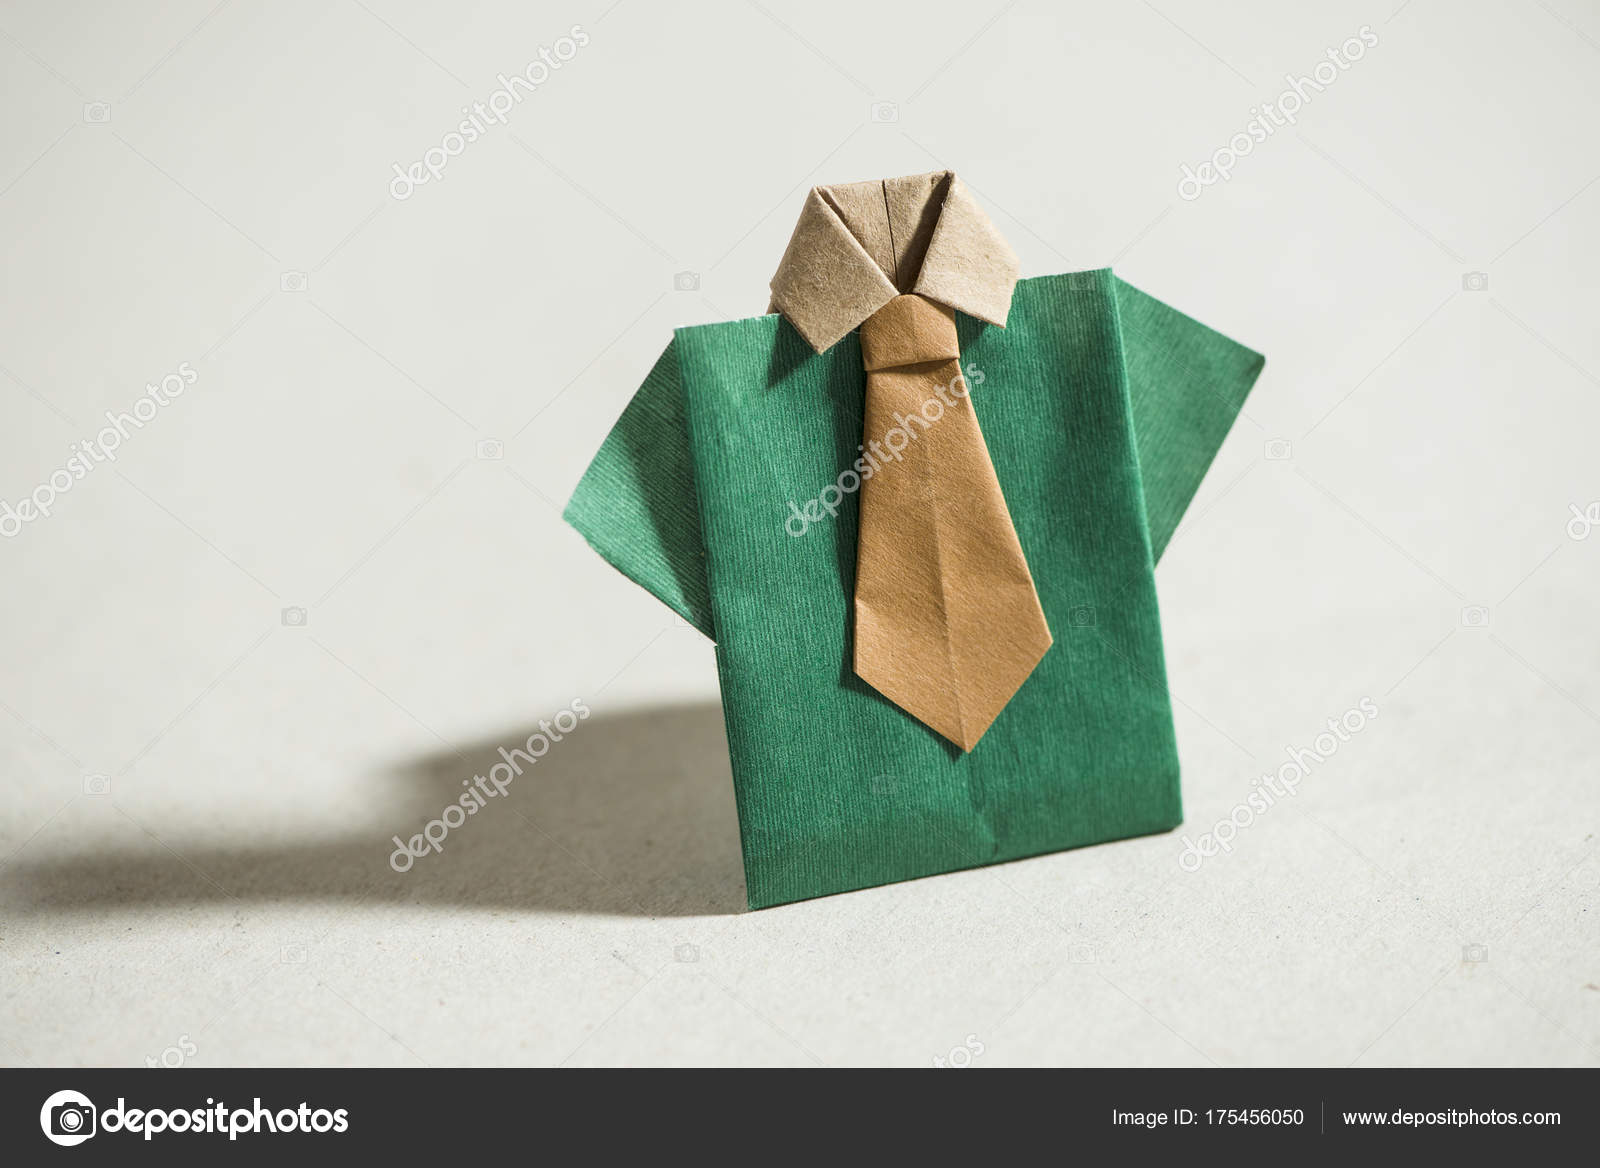 Сорочка орігамі папері — Стокове фото — Грін © degimages  175456050 48273024083d6